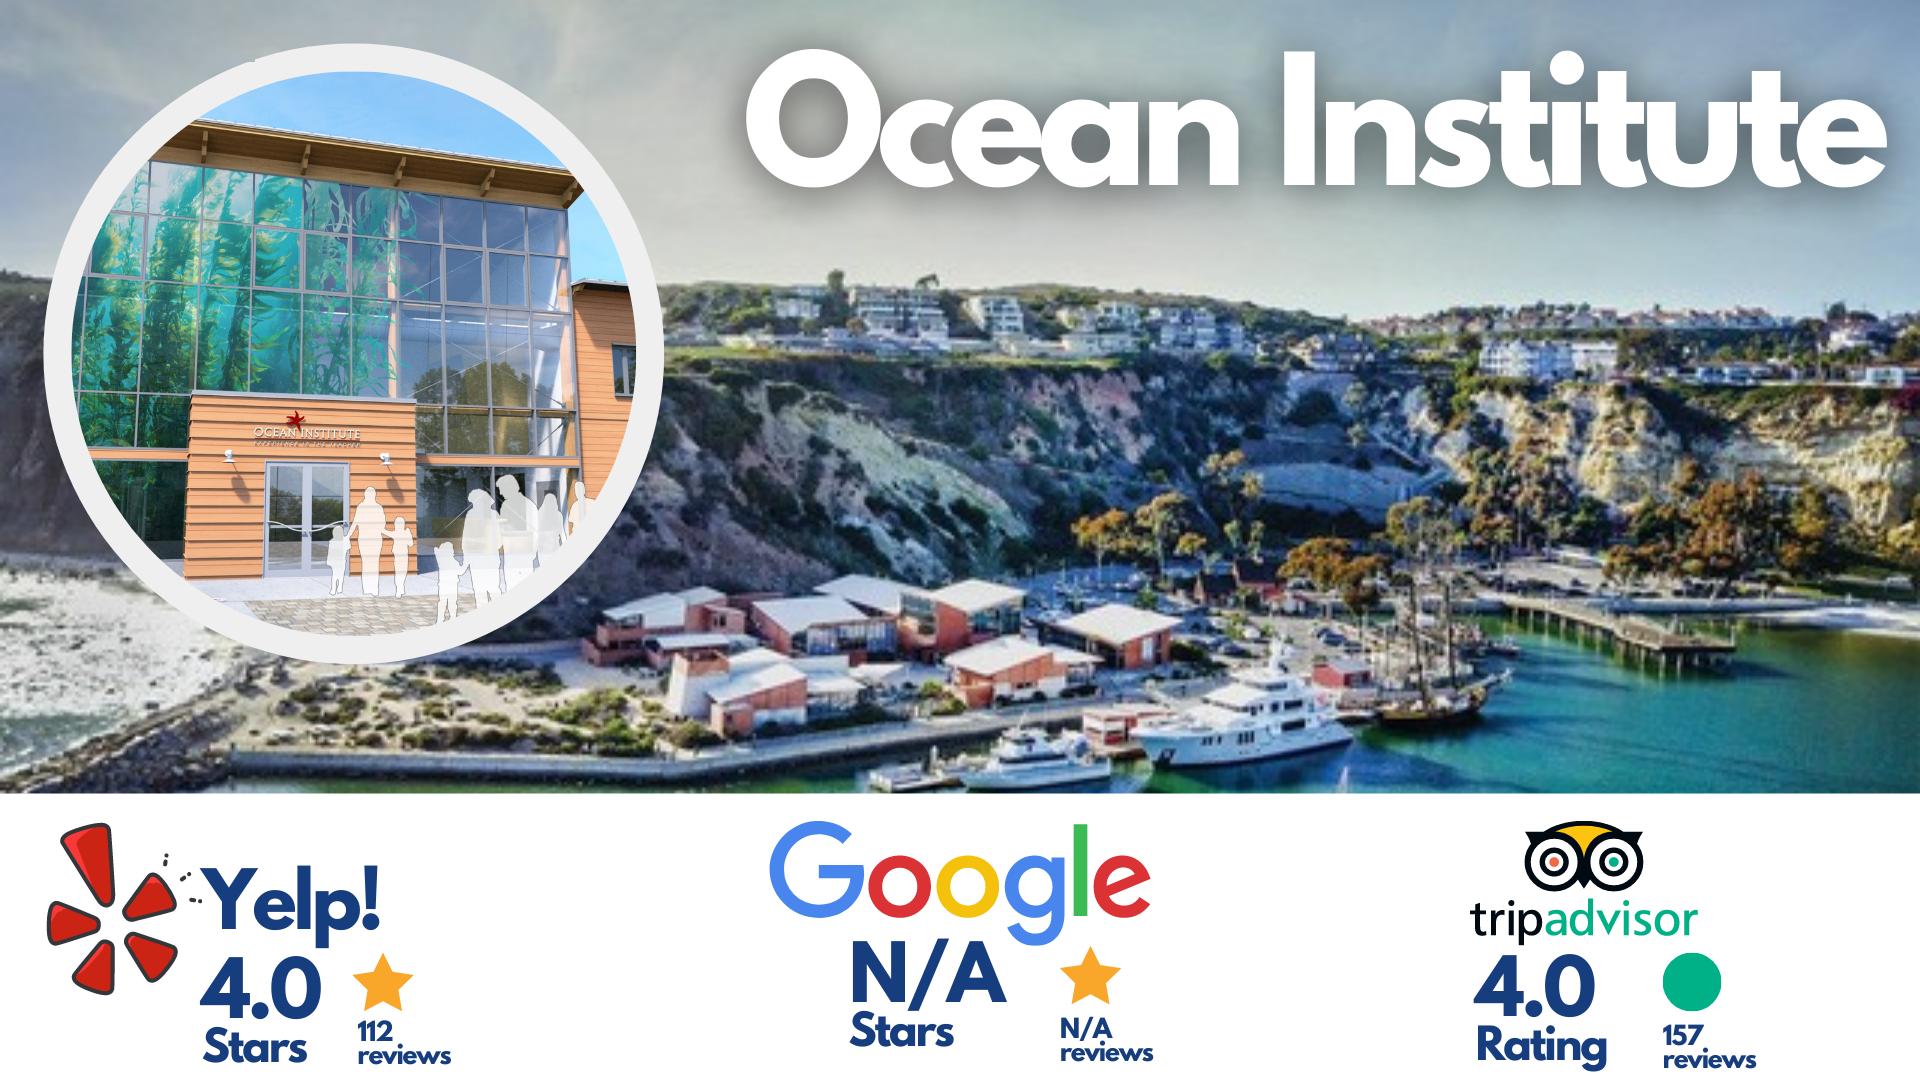 Ocean Institute Dana Point, California